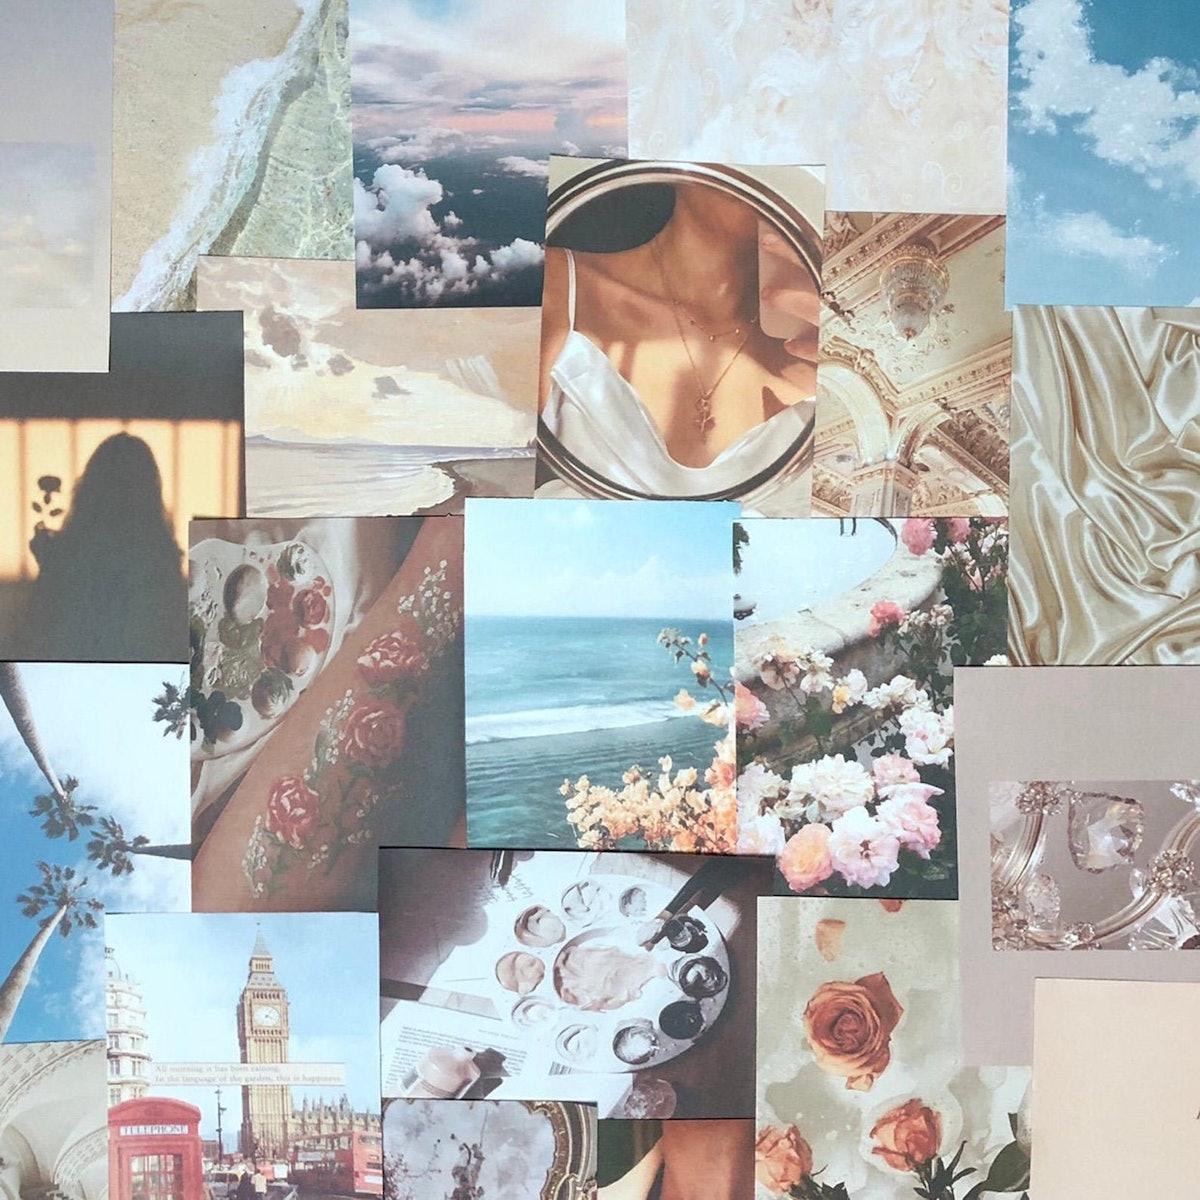 Cloudy Collage Kit - 33 Prints